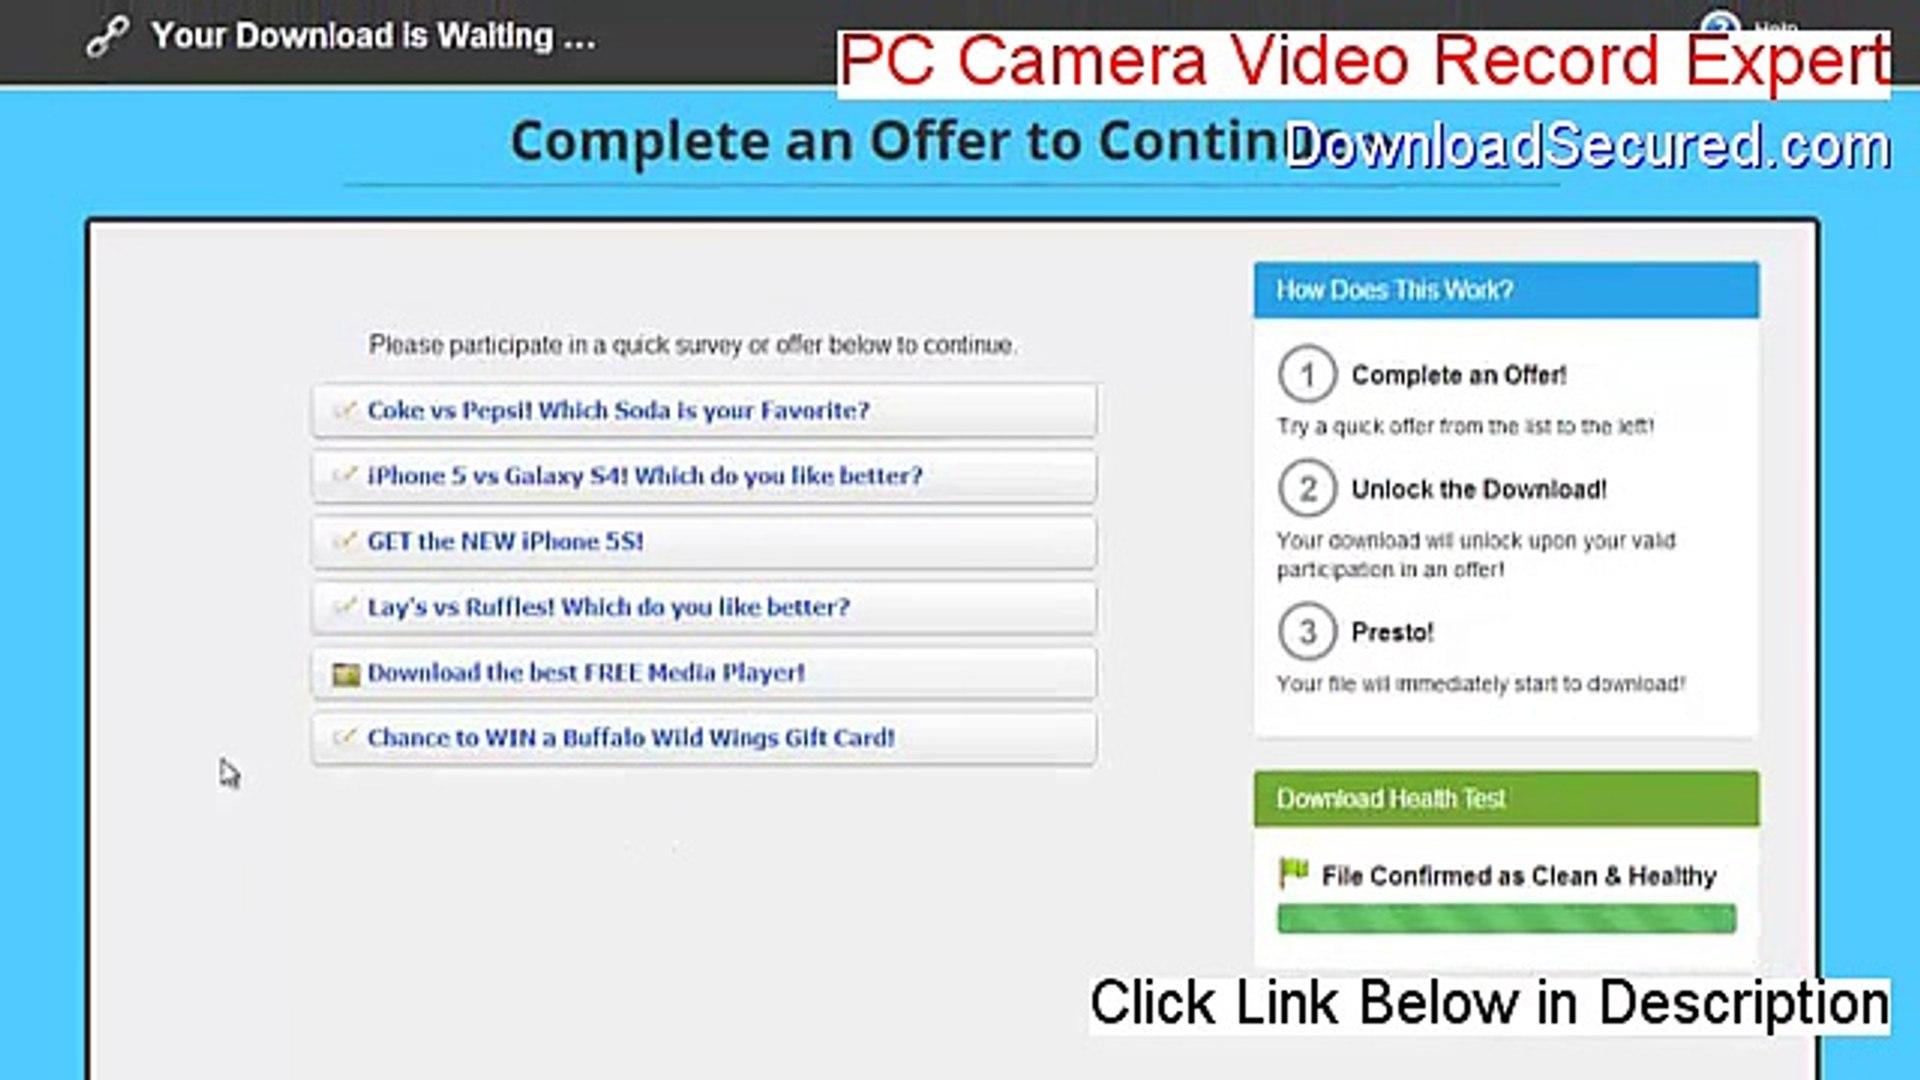 TÉLÉCHARGER PC CAMERA VIDEO RECORD EXPERT V1.0.0.1